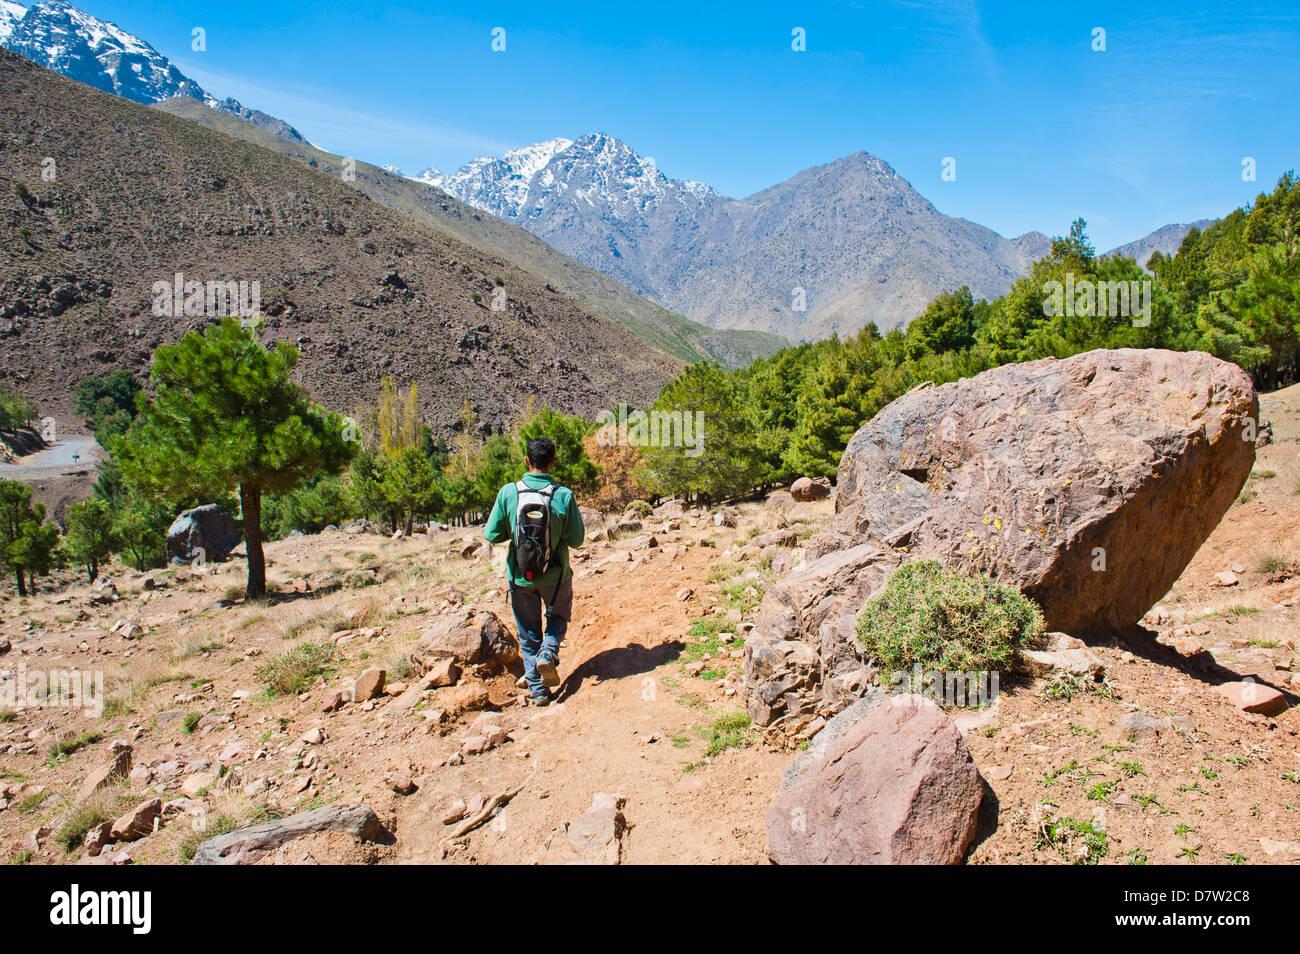 Reiseleiter, trekking im Imlil-Tal auf dem Weg von Tizi n Tamatert in Imlil, hoher Atlas, Marokko, Nordafrika Stockbild